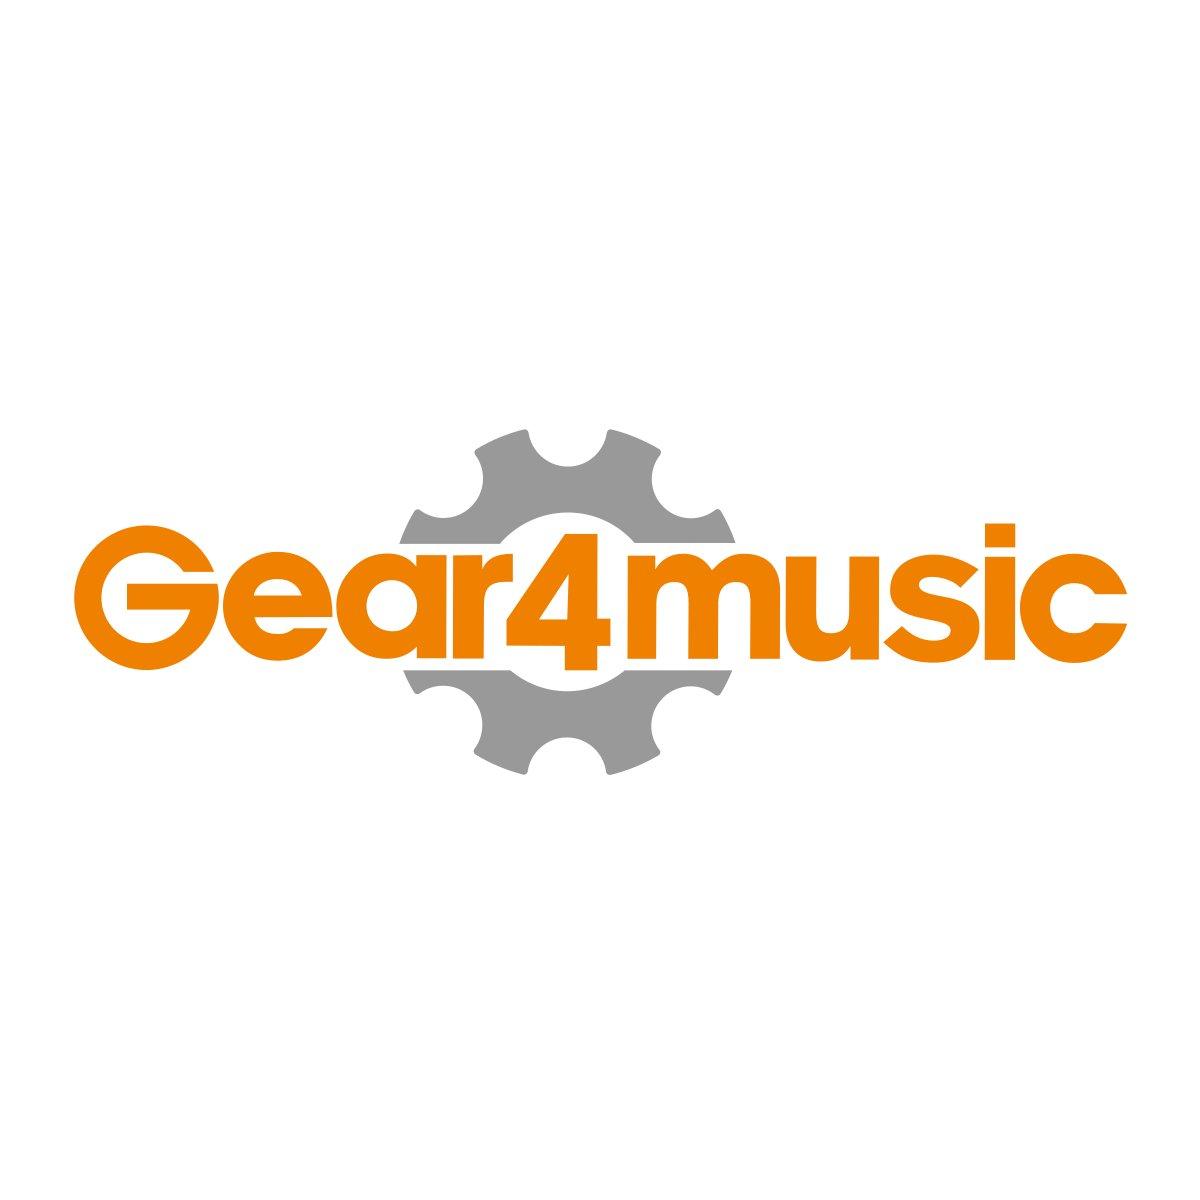 Gear4music stand